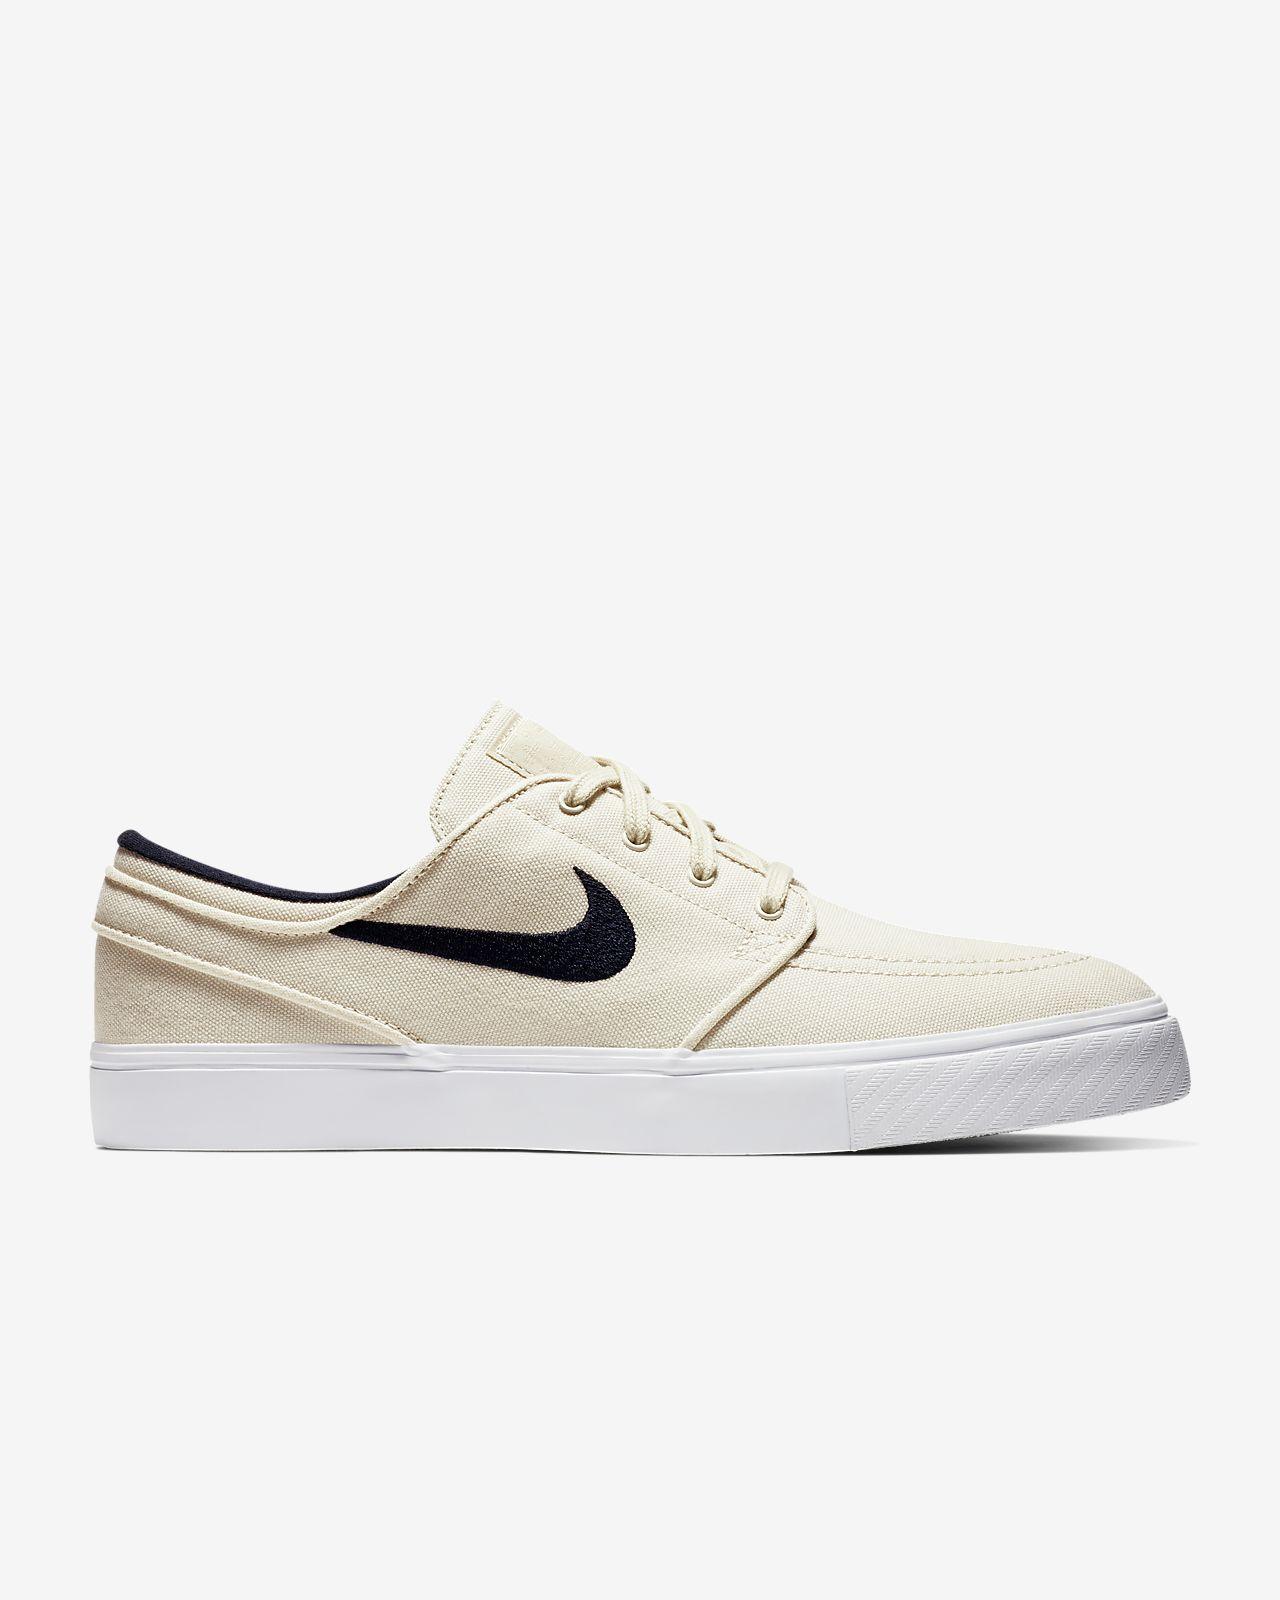 best website 77e7d 626d6 ... Chaussure de skateboard Nike SB Zoom Stefan Janoski Canvas pour Homme